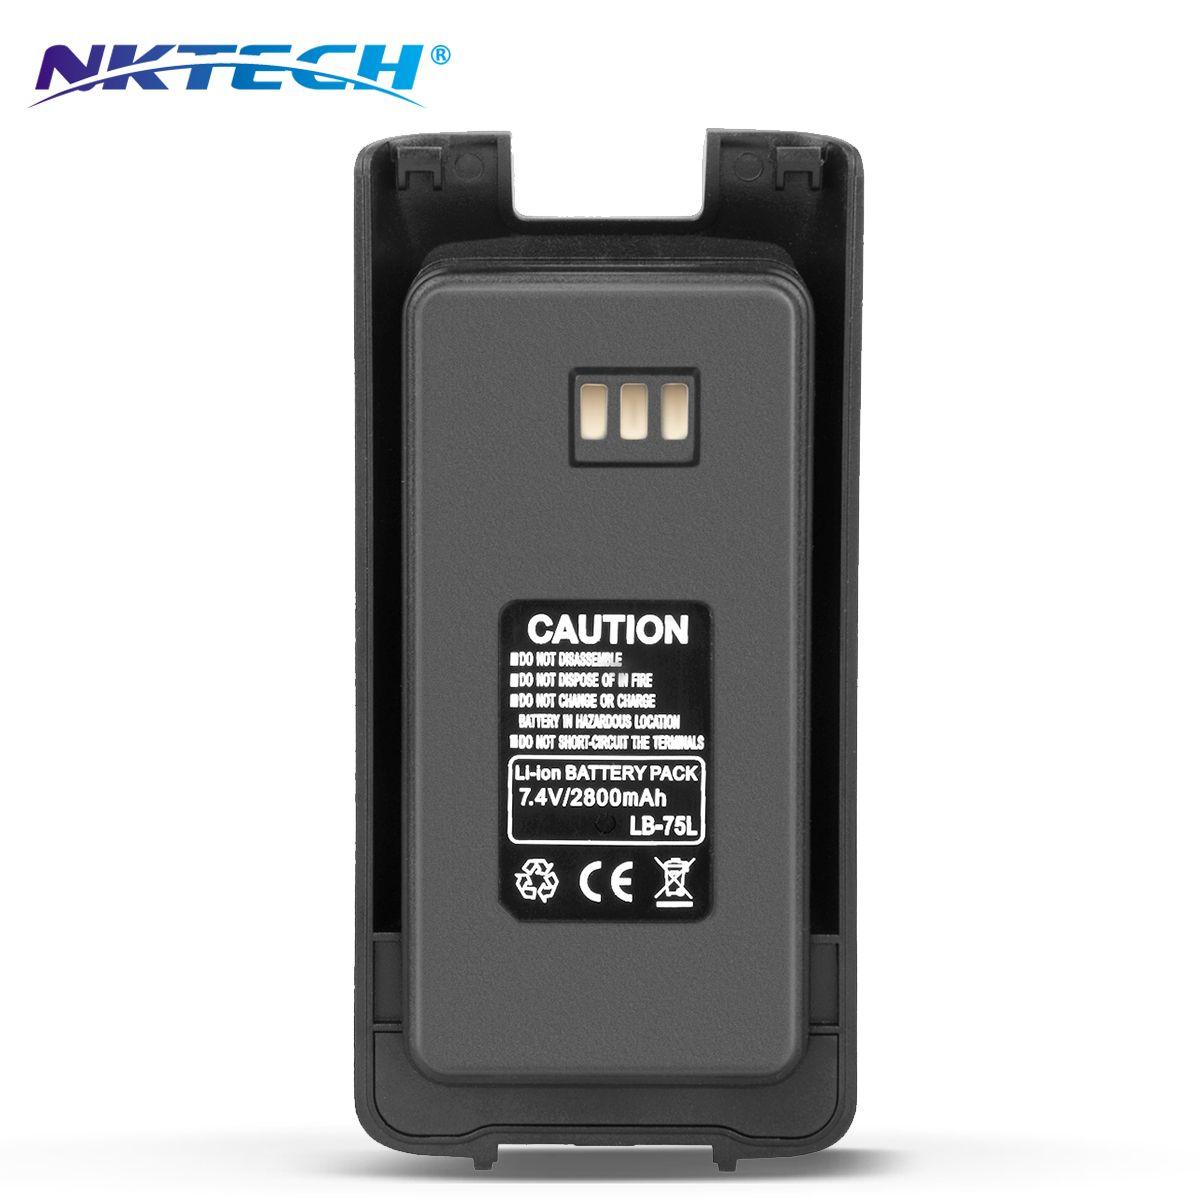 NKTECH Walkie Talkie 7,4 V 2800 mAh Li-Ion Batterie Wasserdicht Für TYT Tytera DMR MD-390 MD-390GPS Digitalen Mobilfunk Transceiver